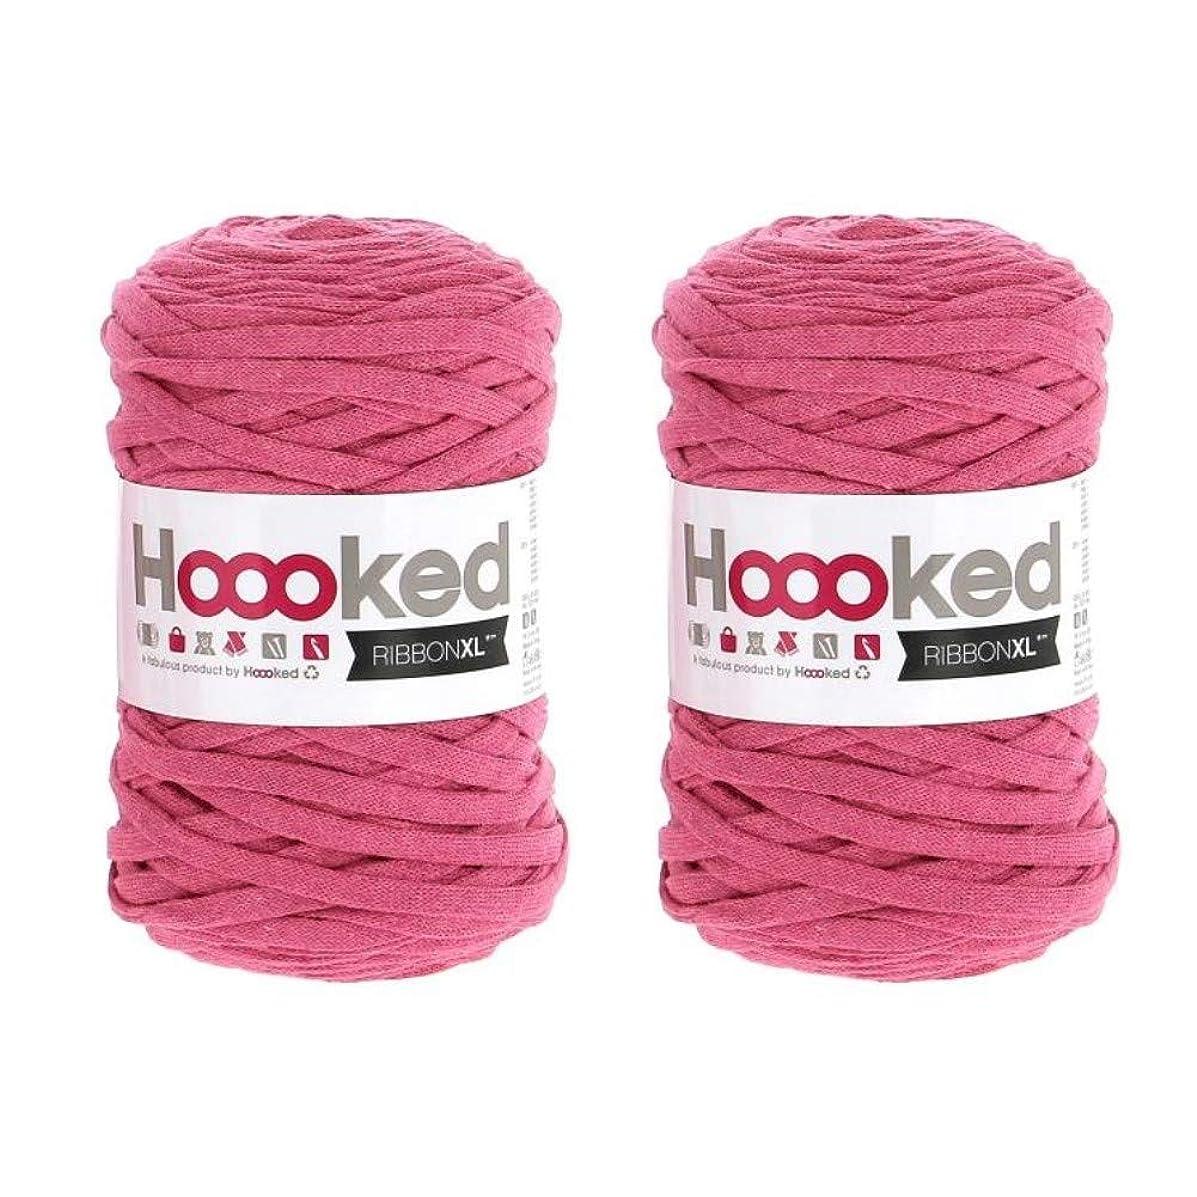 Hoooked Ribbon XL Yarn (2 Pack) - Bubblegum (RXL 27)